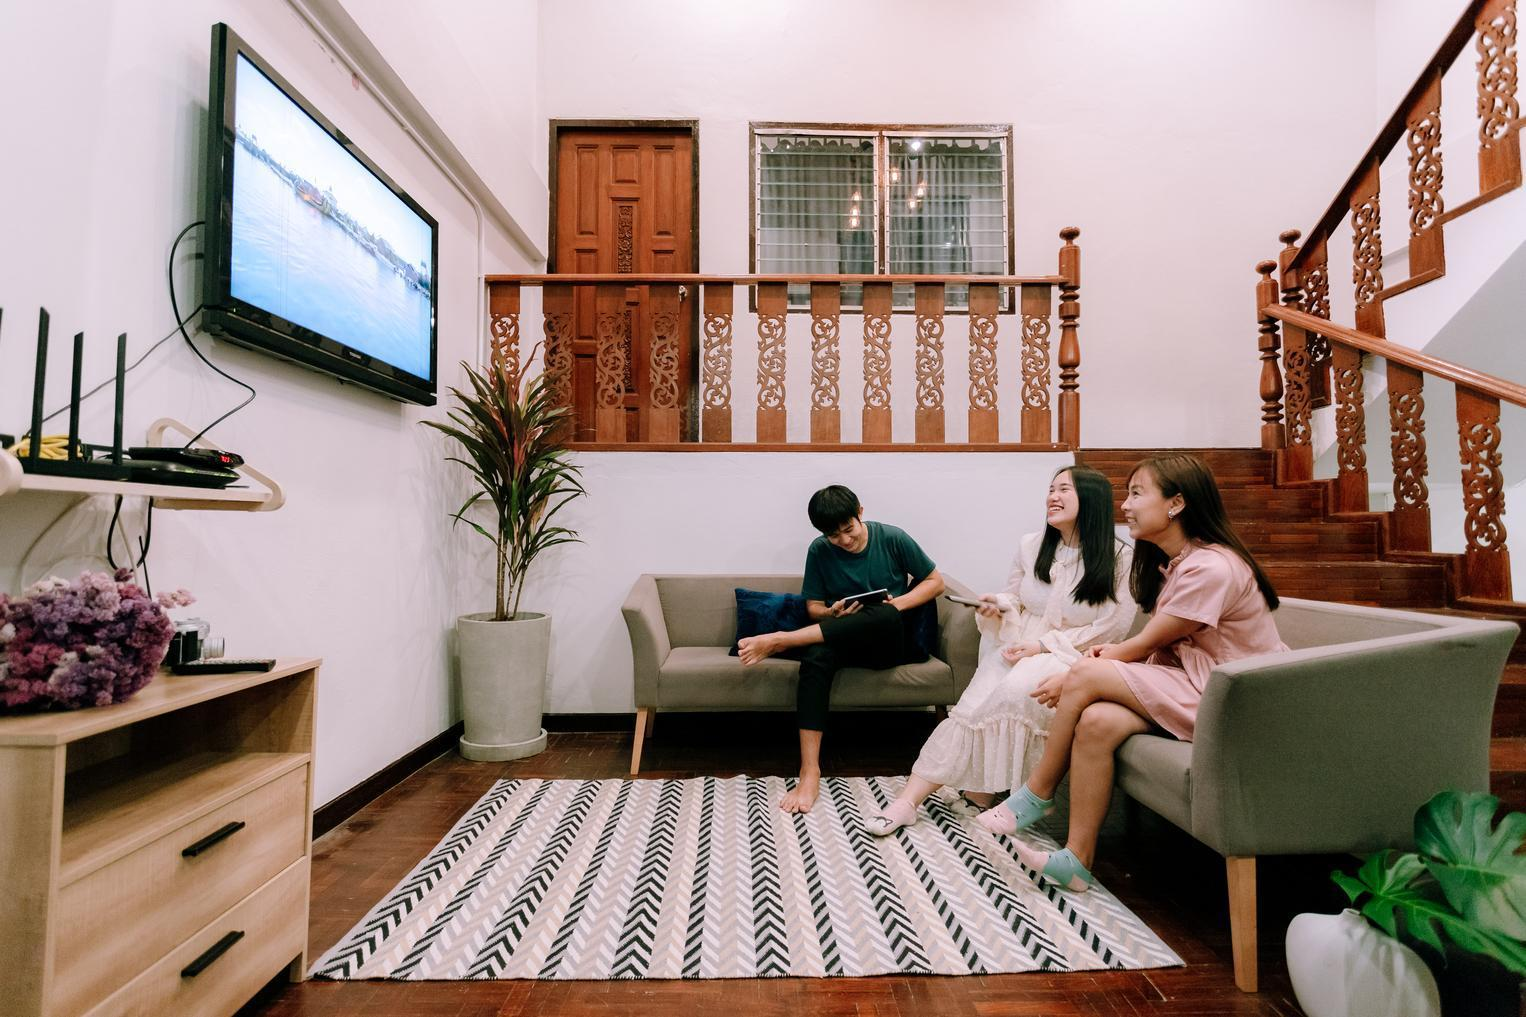 No.9HOUSE in Chiangmai cityNear NIMMAN NearAIRPORT บ้านเดี่ยว 3 ห้องนอน 2 ห้องน้ำส่วนตัว ขนาด 300 ตร.ม. – สนามบินเชียงใหม่